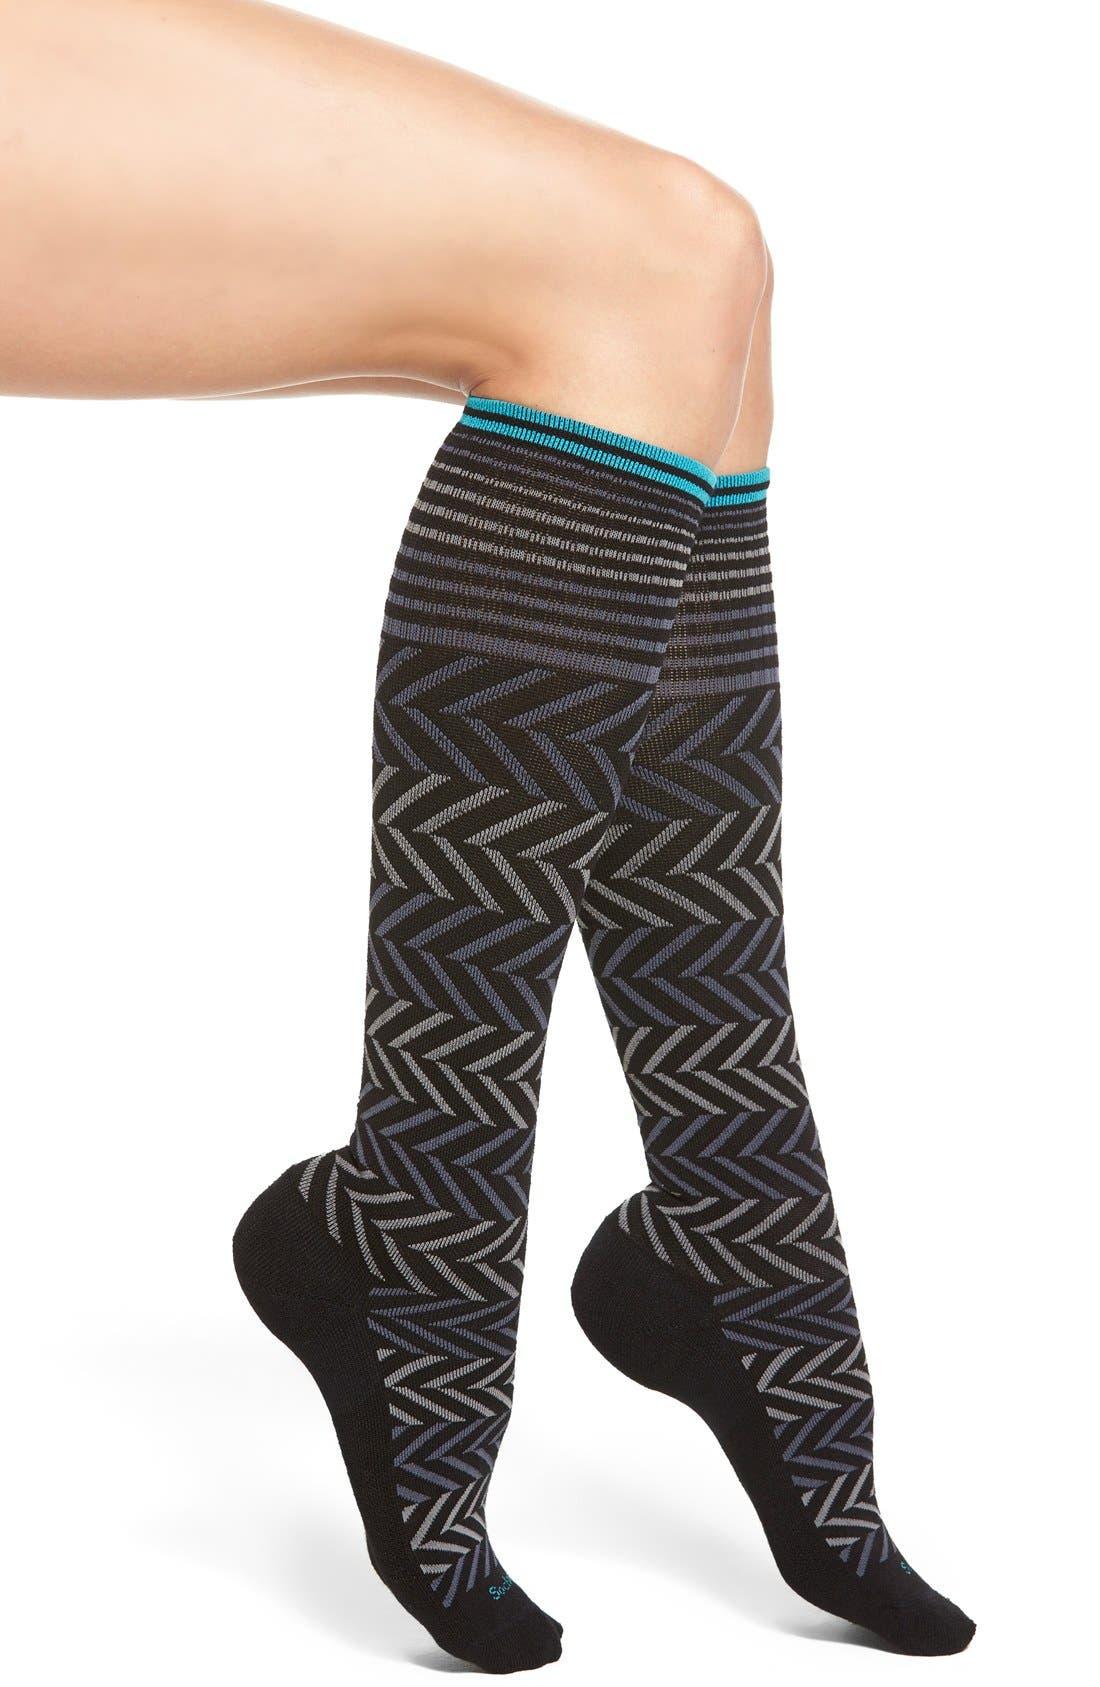 Sockwell Goodhew Graduated Compression Socks